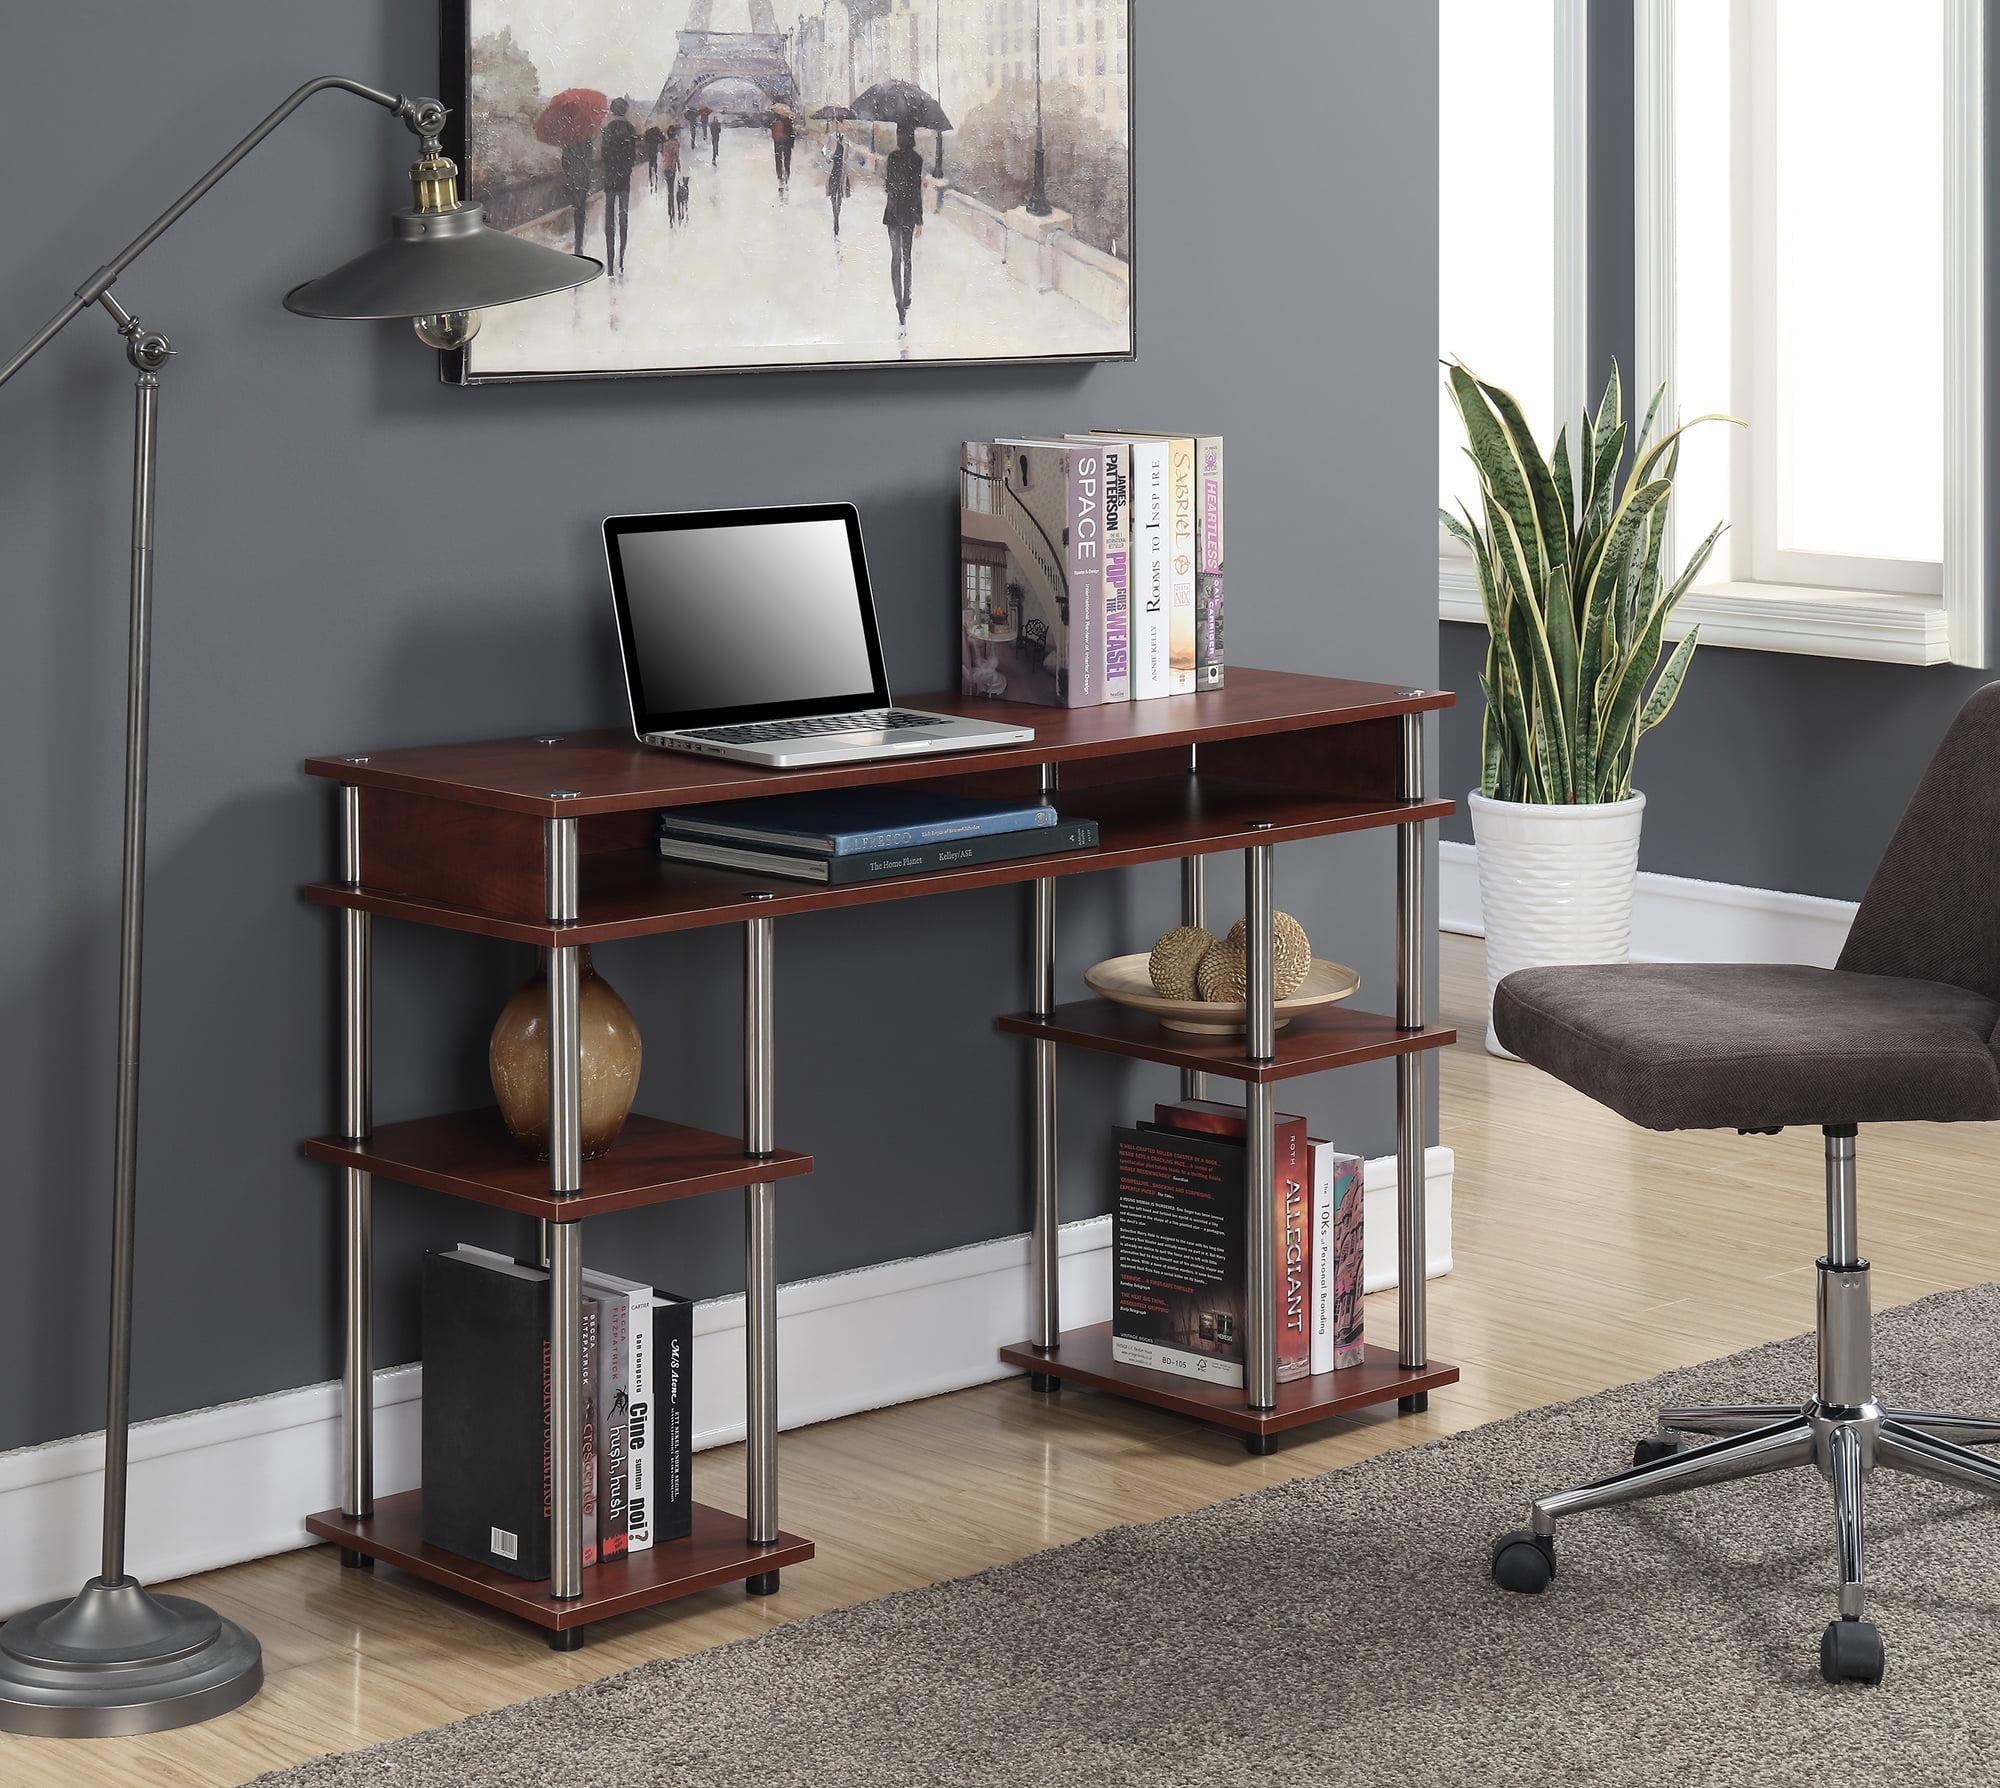 Convenience Concepts Designs2Go No Tools Student Desk, Multiple Colors by Convenience Concepts, Inc.